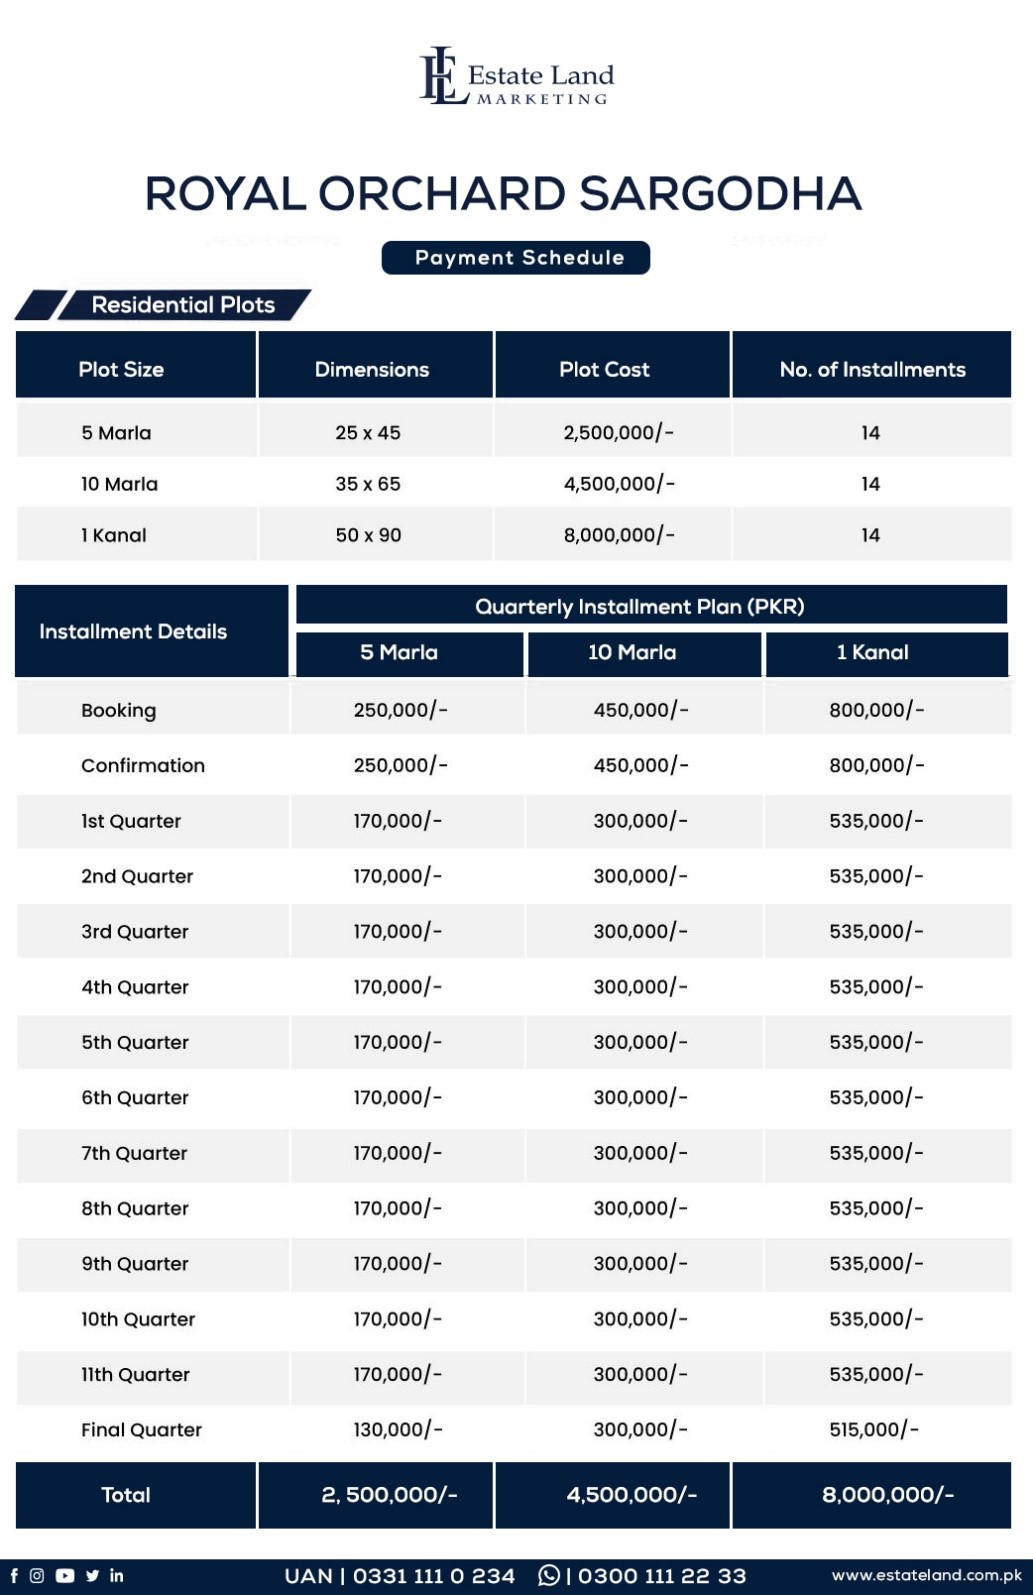 Royal Orchard Sargodha plot prices and payment plan